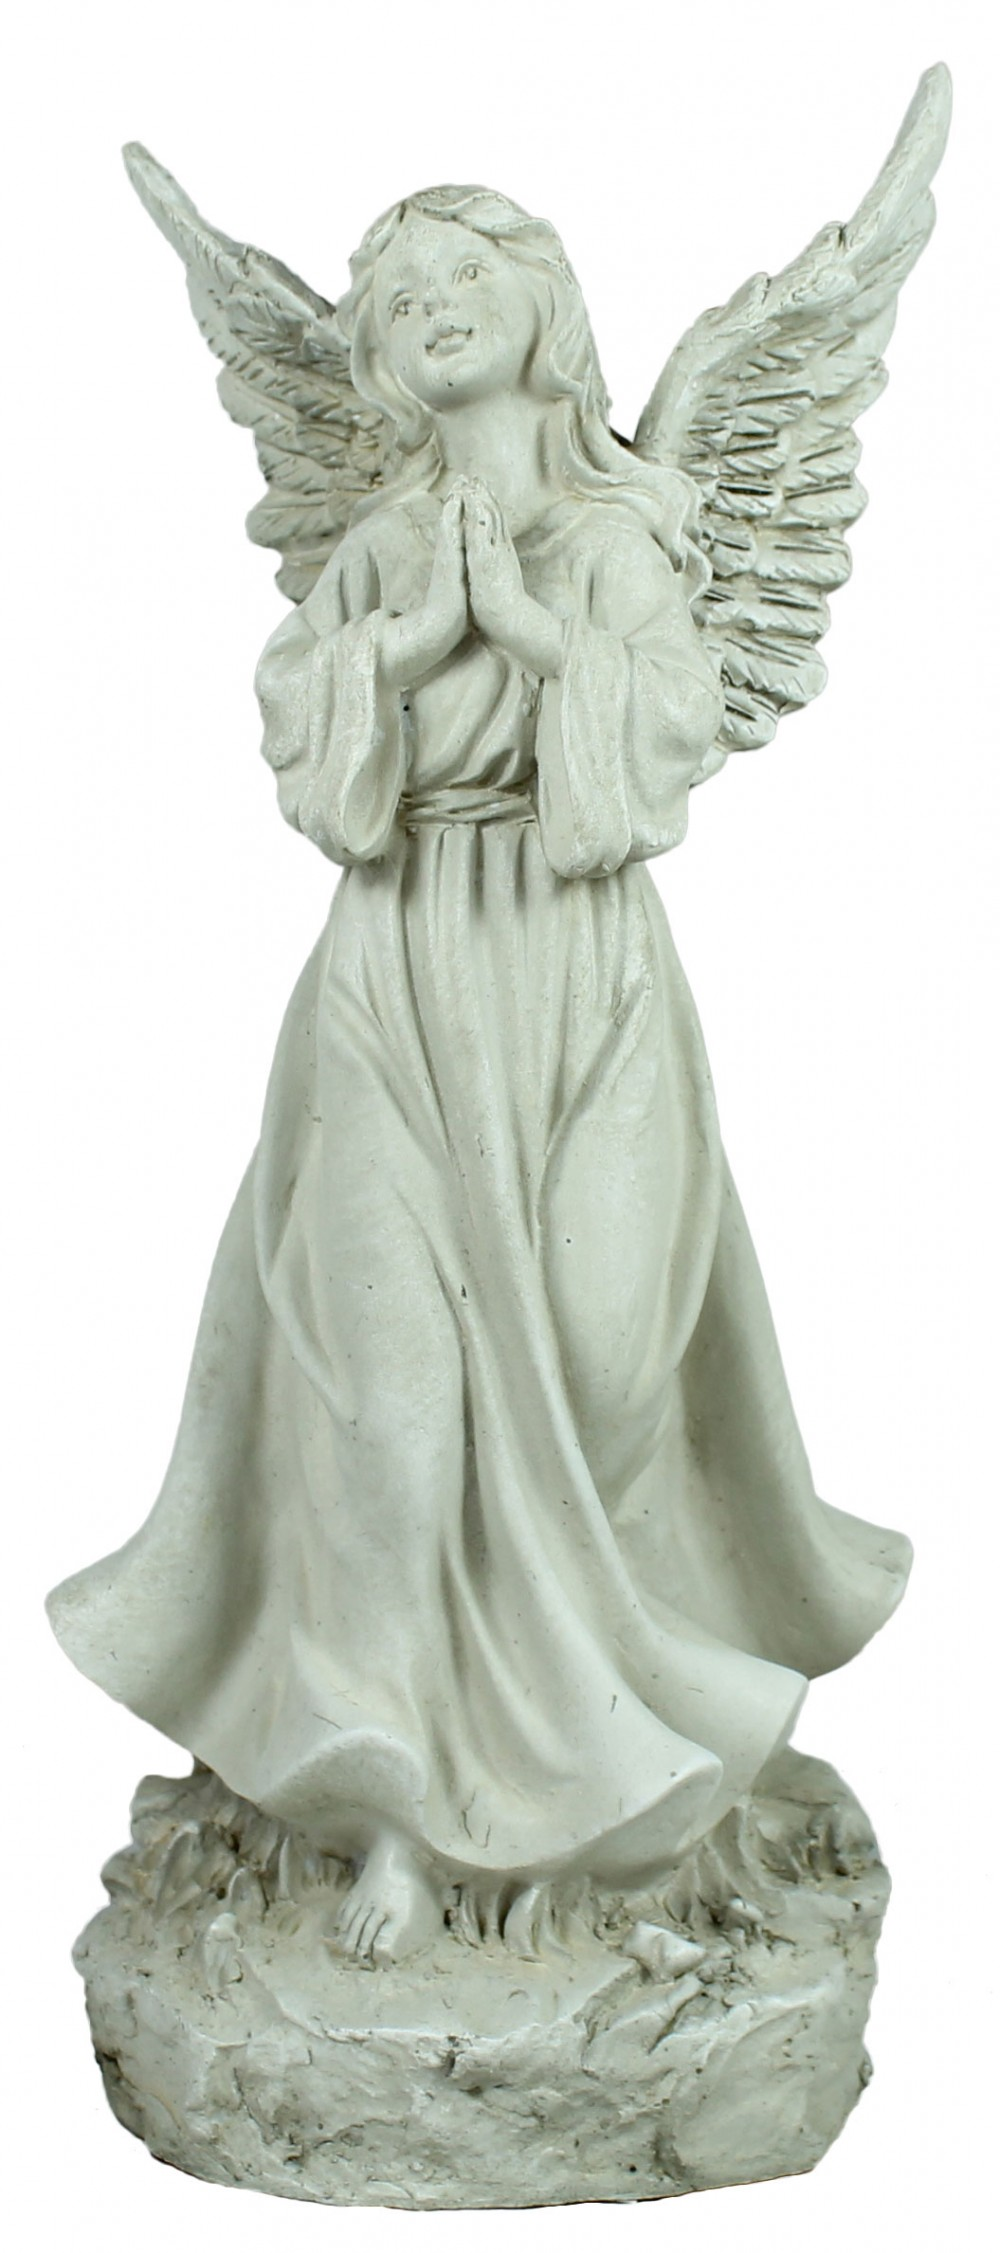 deko engel betender engel engelfigur grabengel grabschmuck dekofigur 01